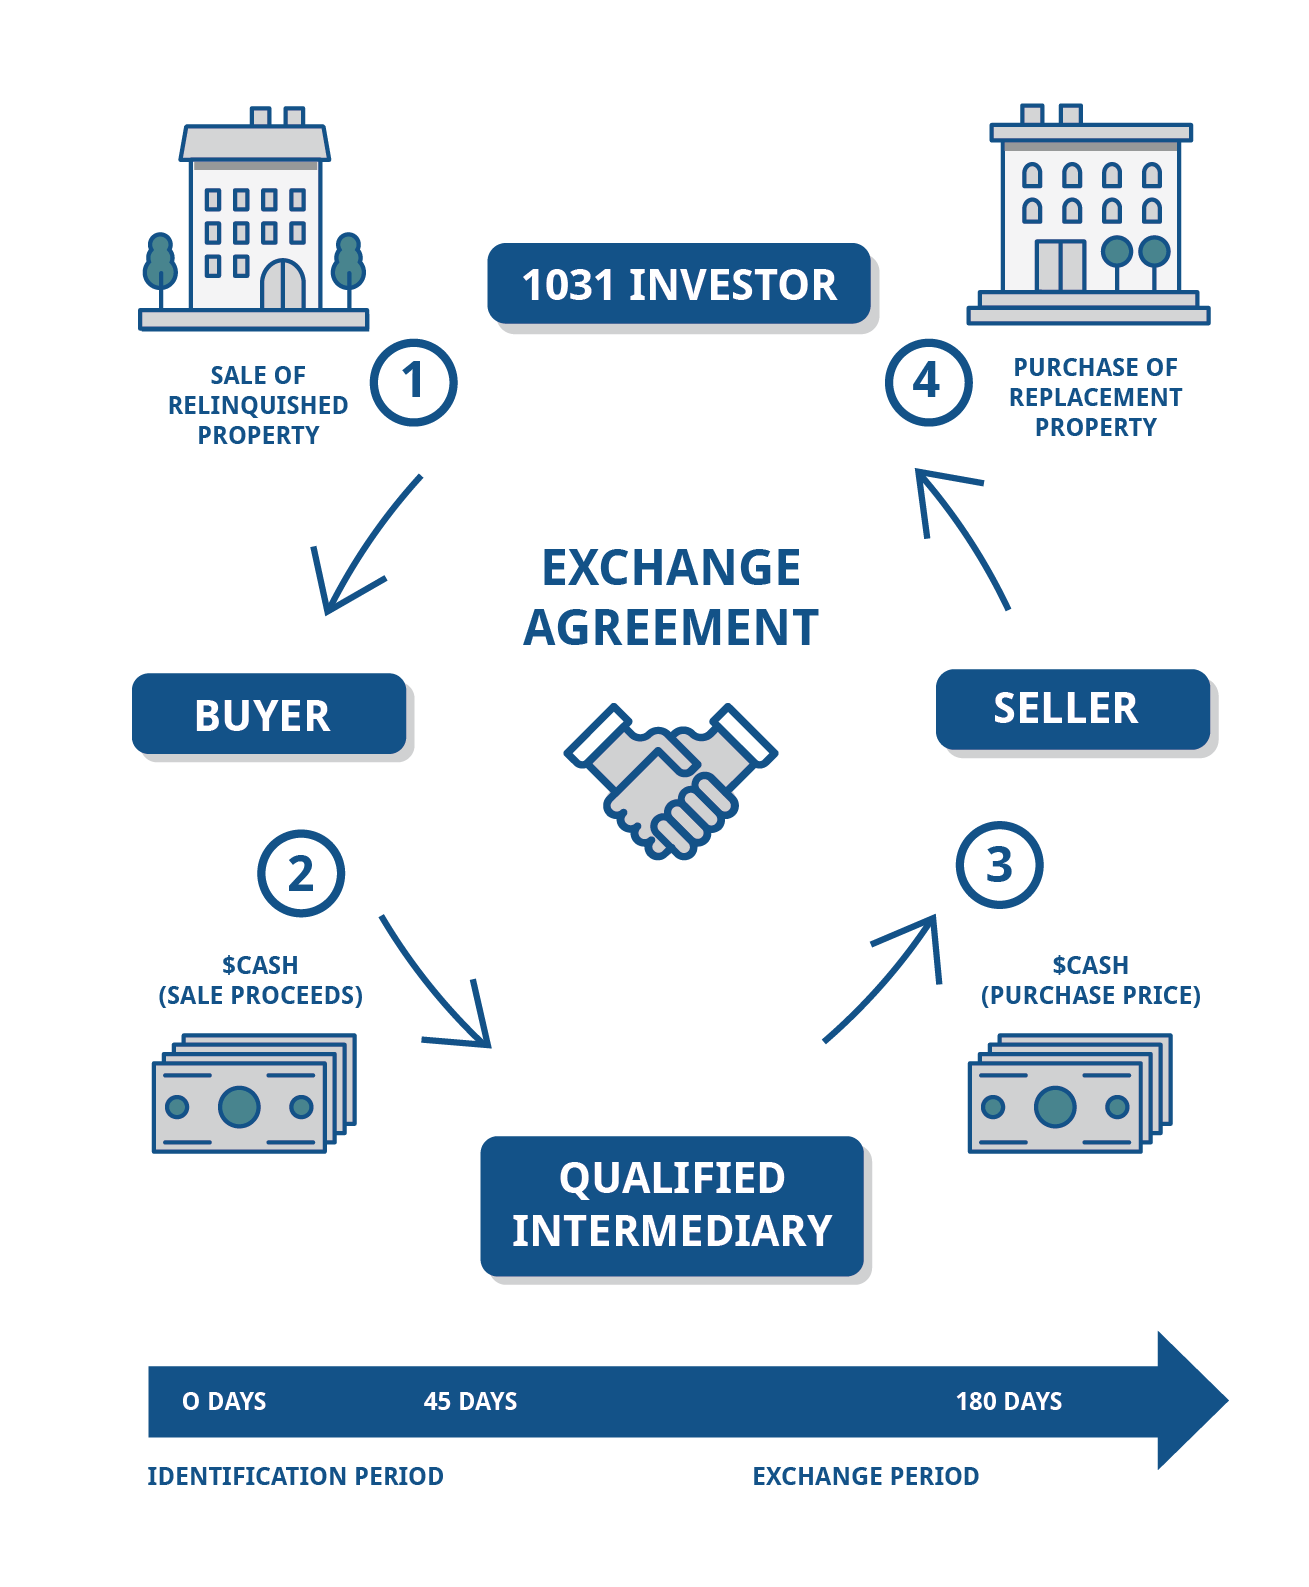 IRS Gov 1031 Exchange Rules